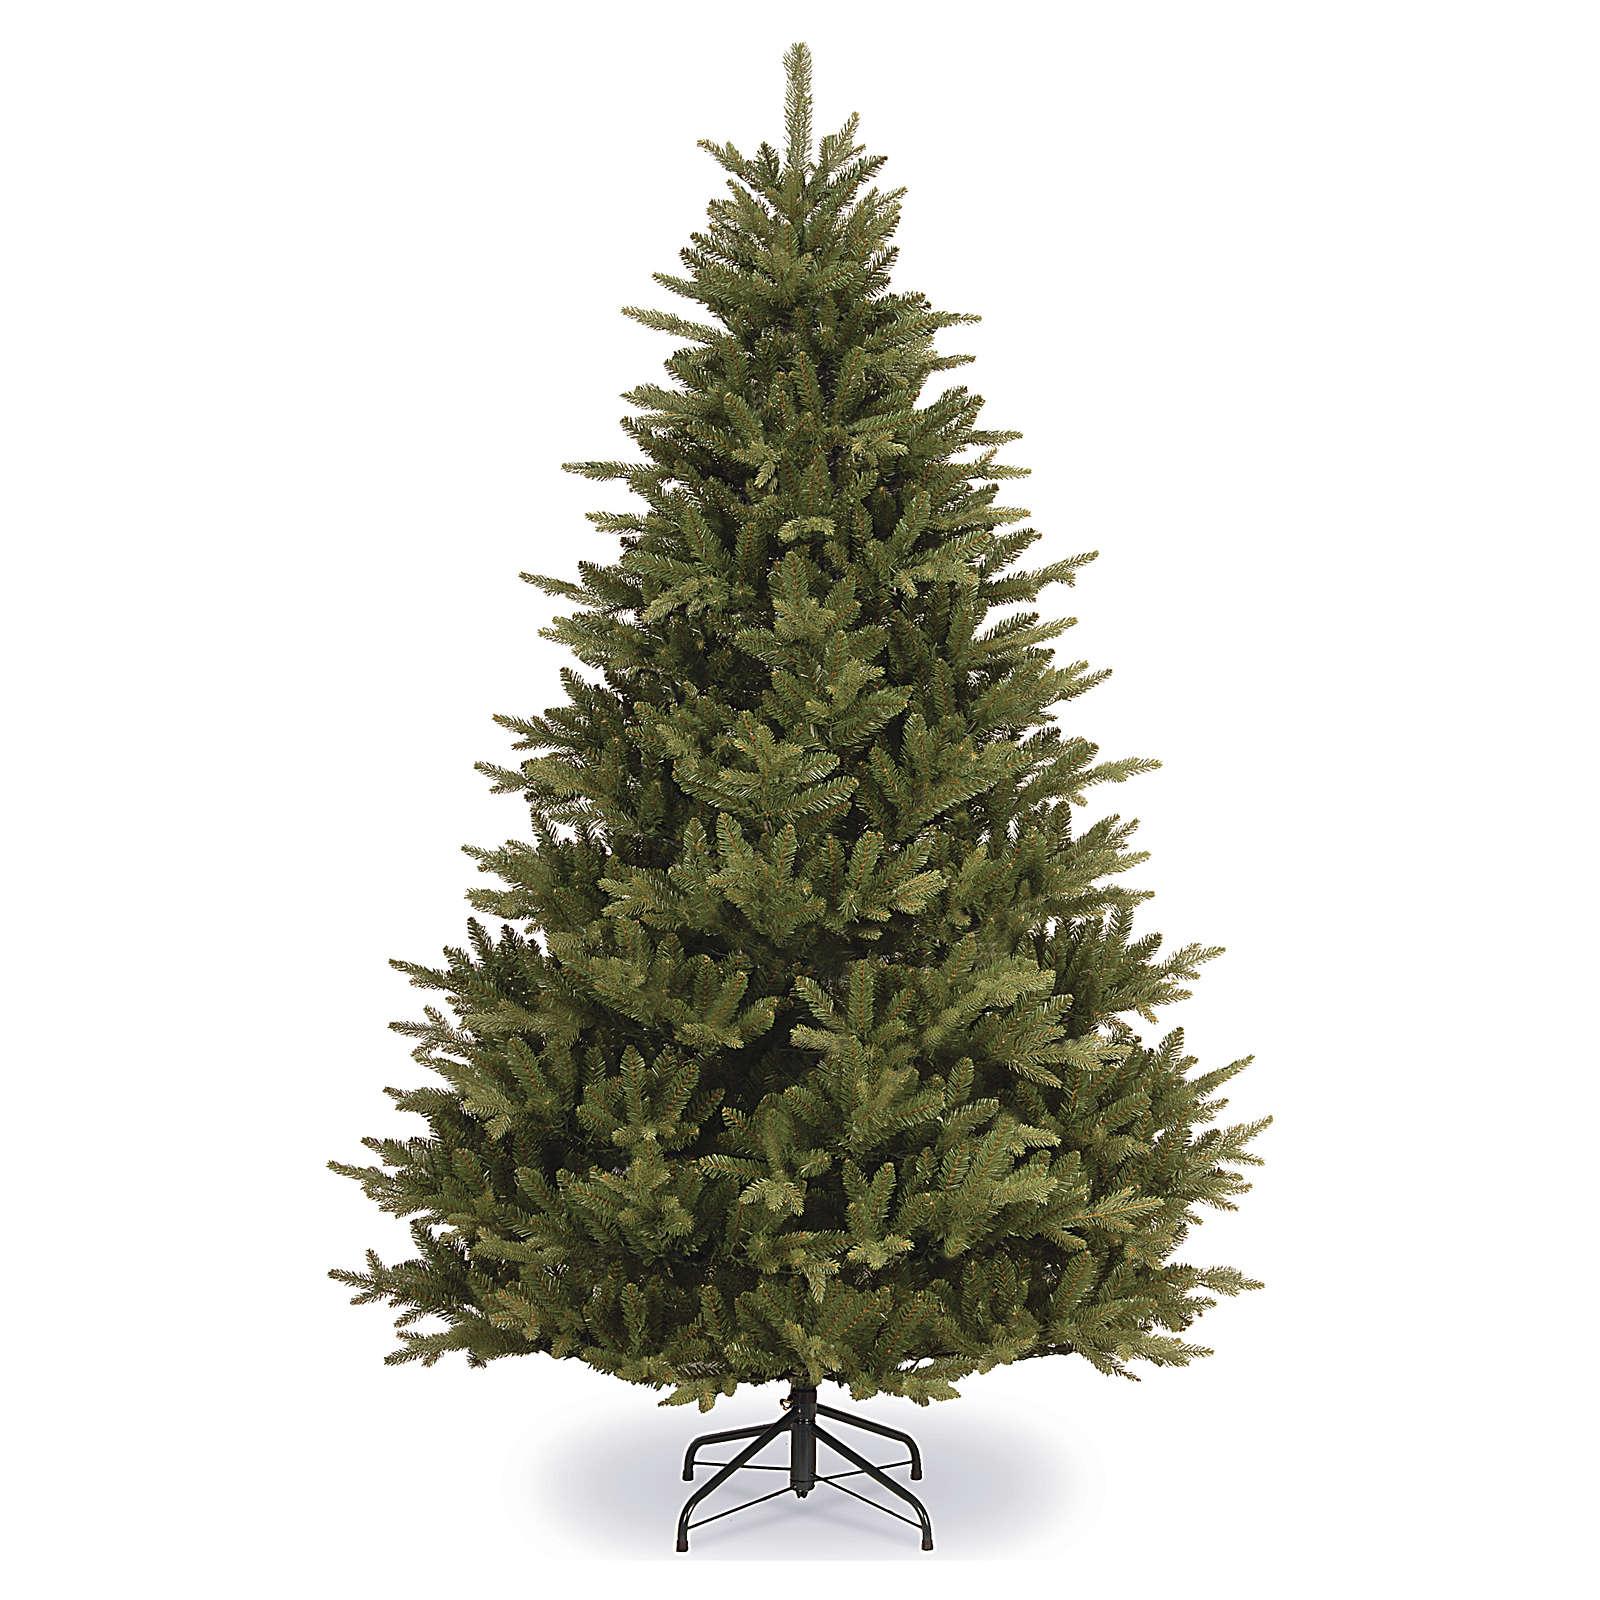 Árvore de Natal 225 cm polietileno feel-real verde Bloomfield Fir 3